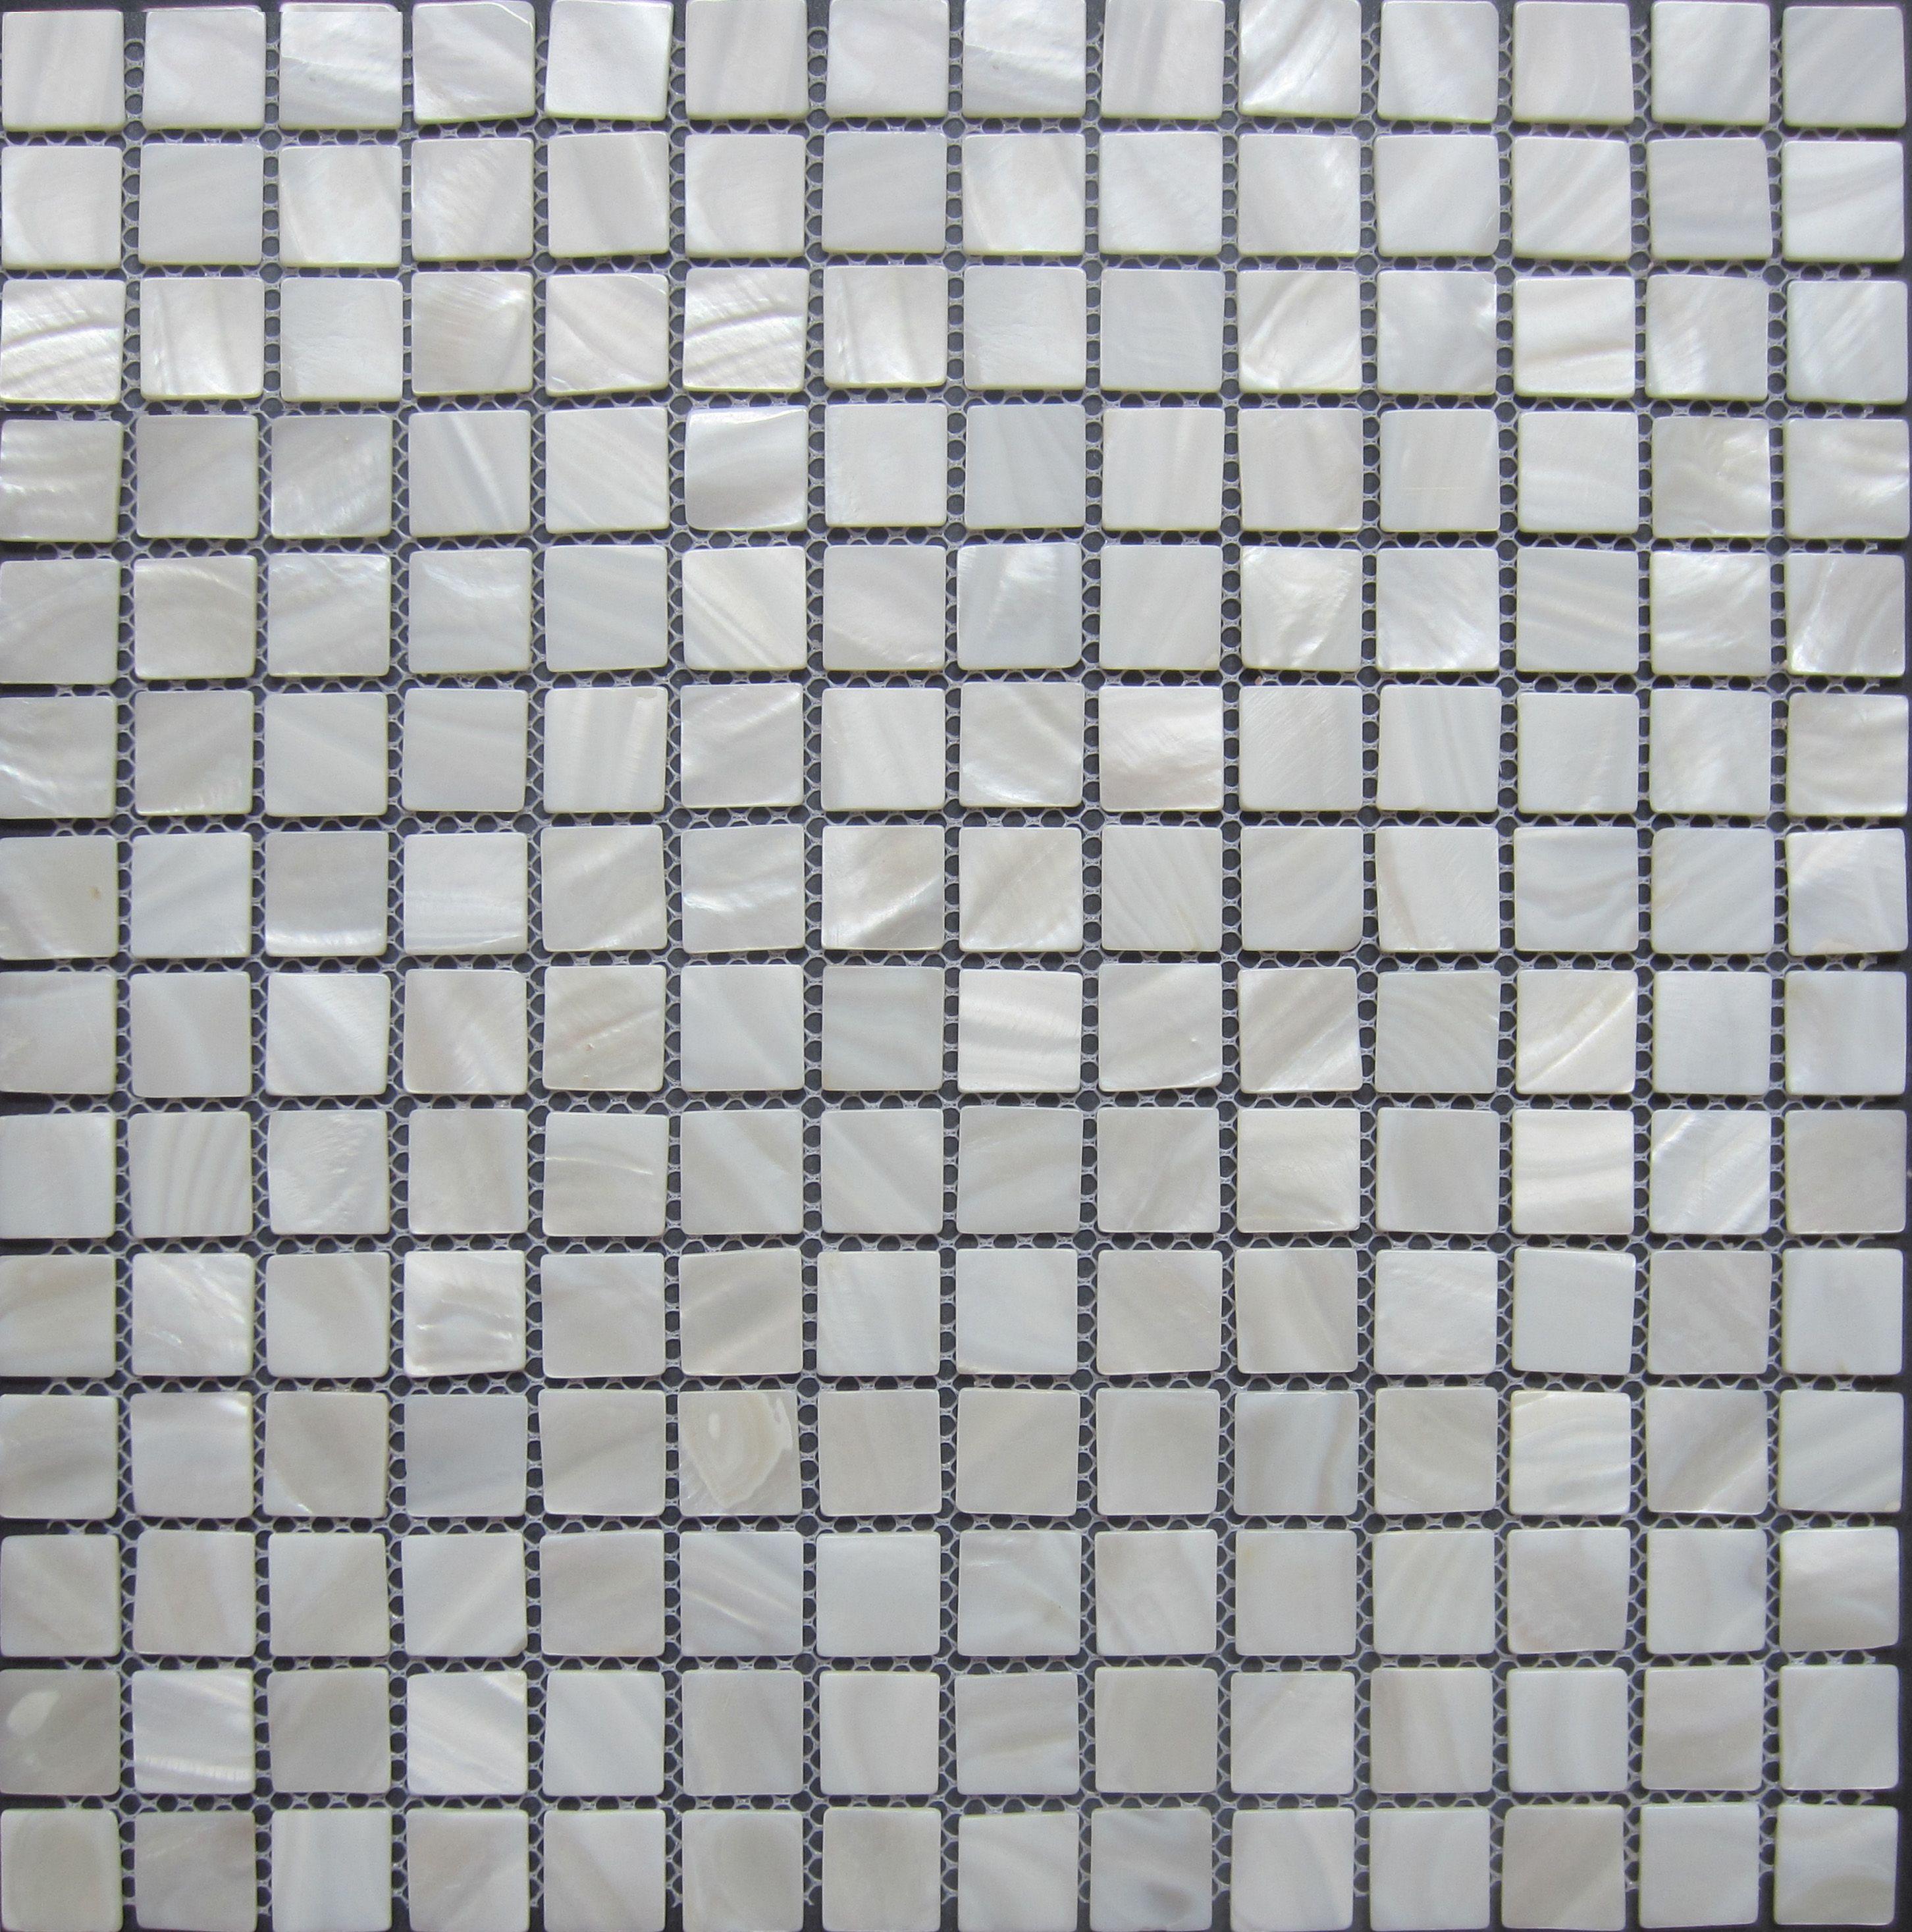 Acquista Lustre Mosaico Piastrelle Pareti; Tessere Di Mosaico In ...